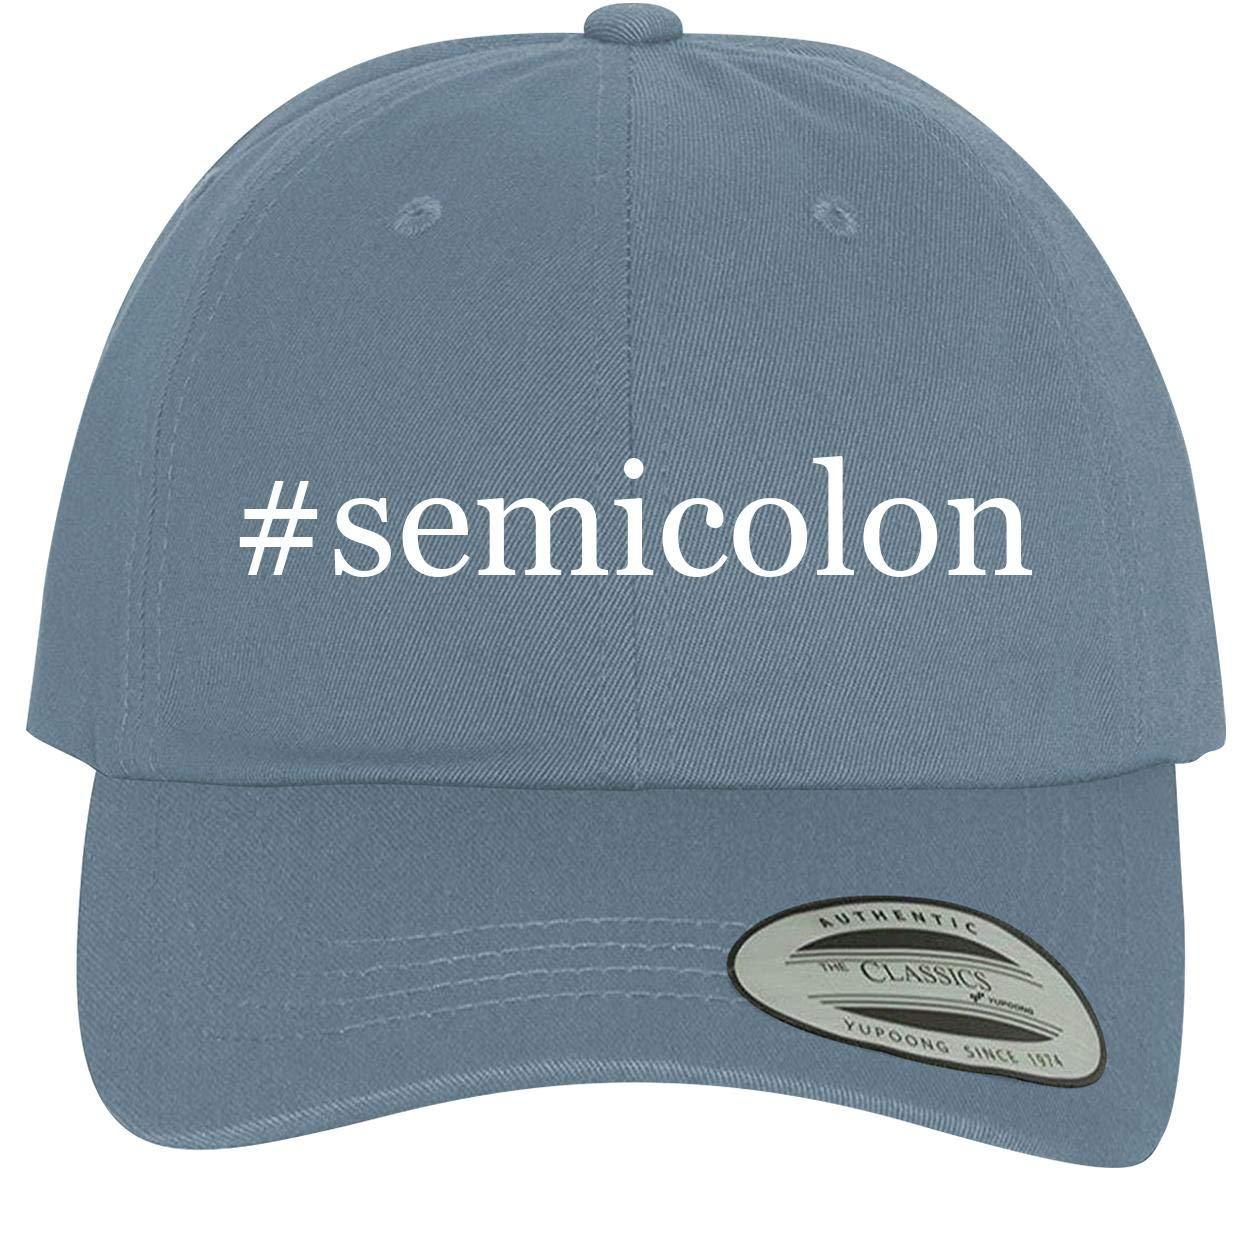 Comfortable Dad Hat Baseball Cap BH Cool Designs #Semicolon